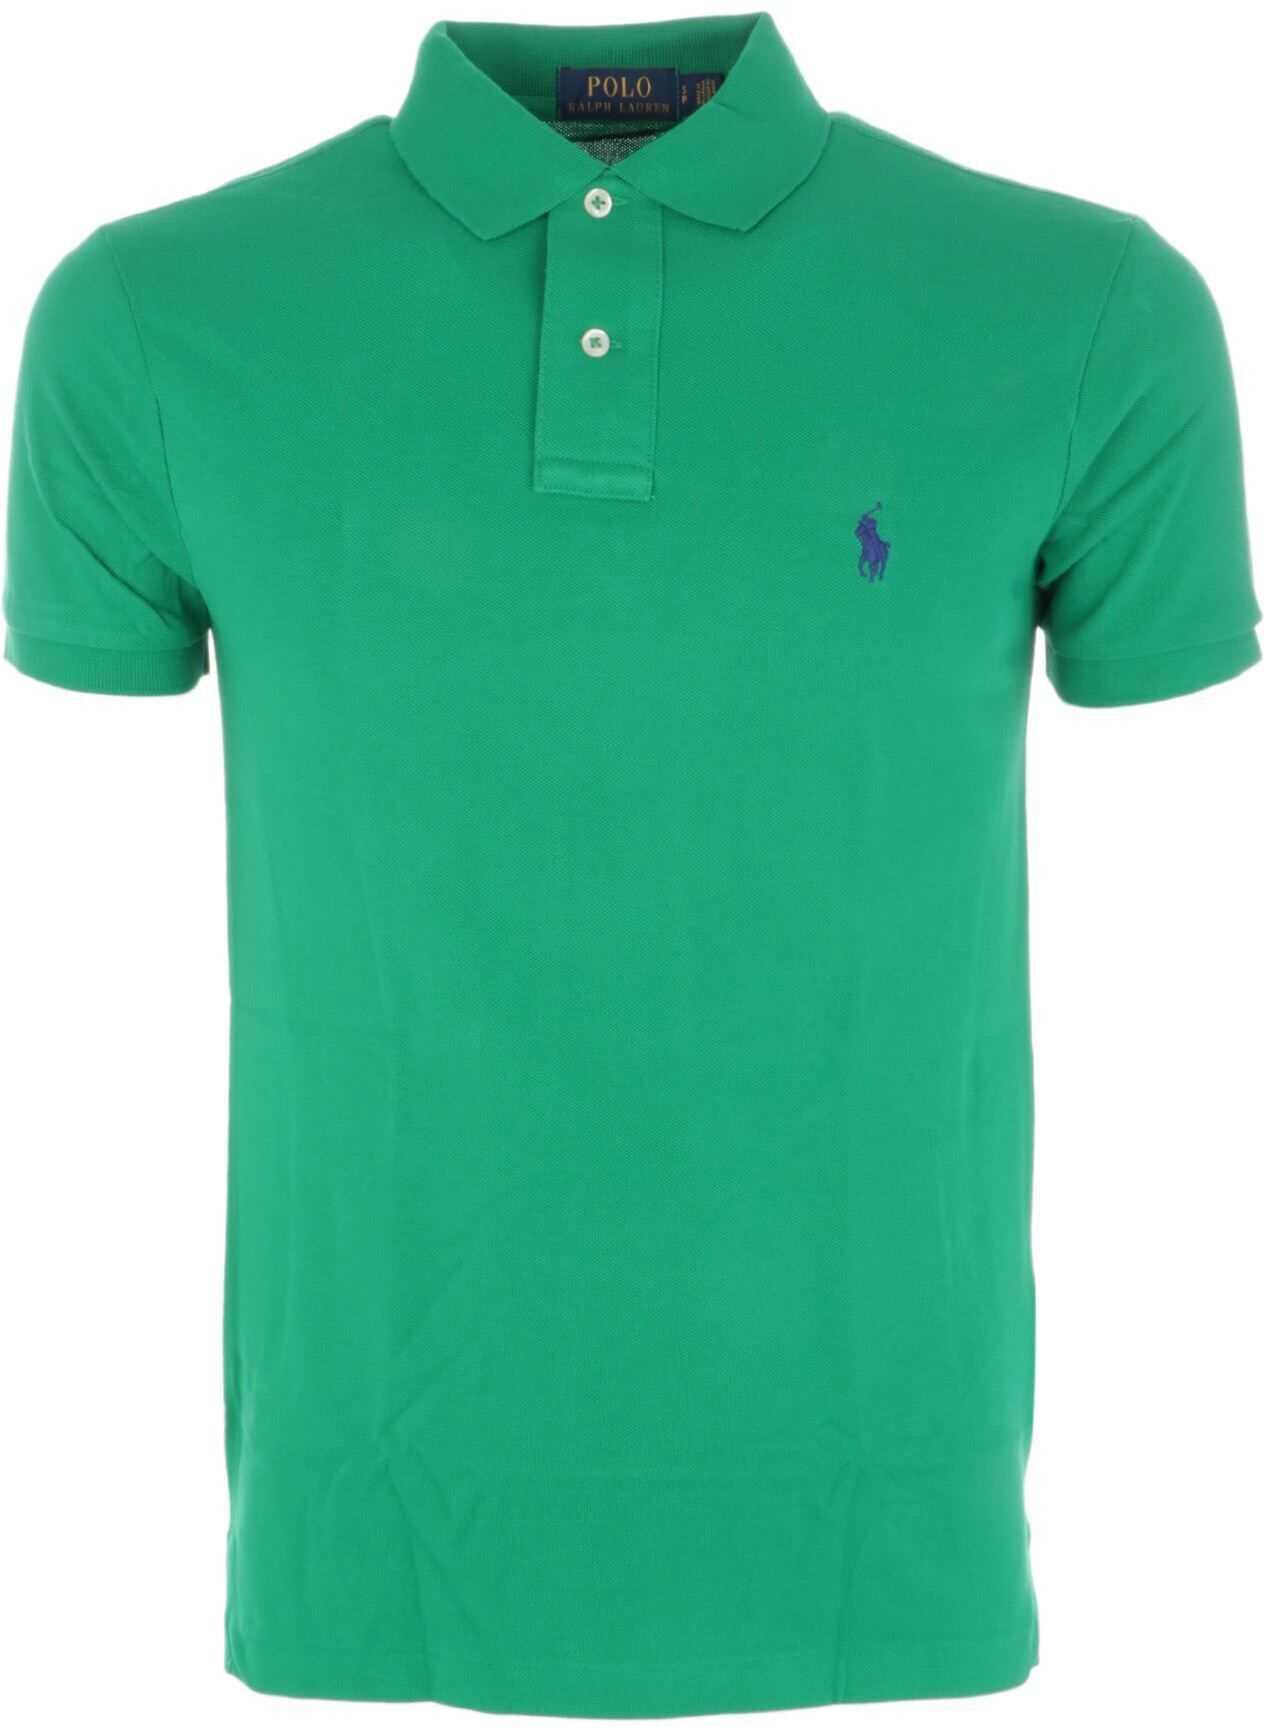 Ralph Lauren Green Slim Fit Cotton Pique Polo Green imagine